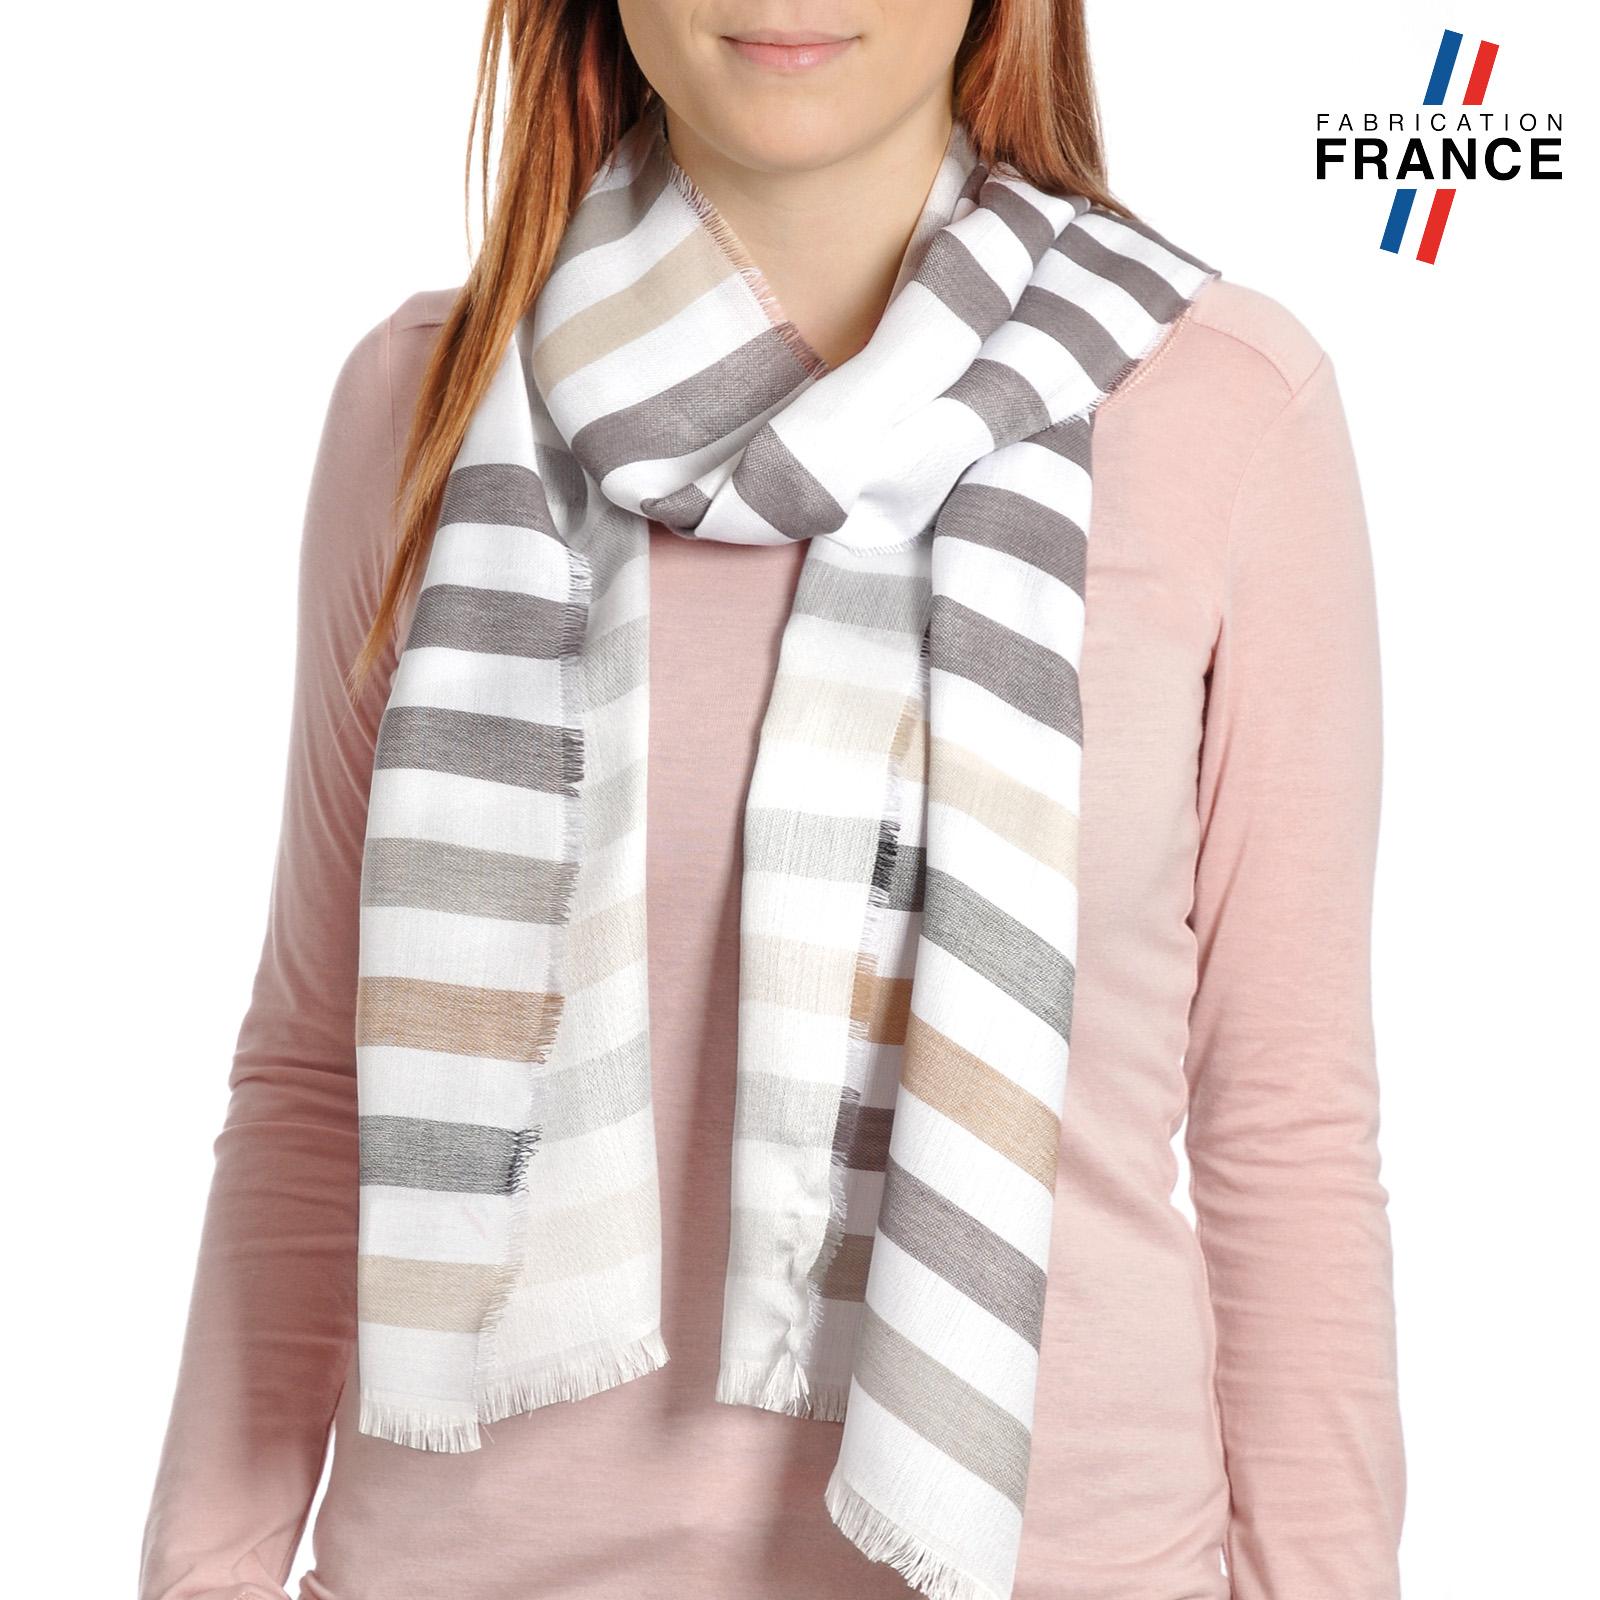 AT-04292-VF16-LB_FR-echarpe-femme-gris-beige-qualicoq-a-rayures